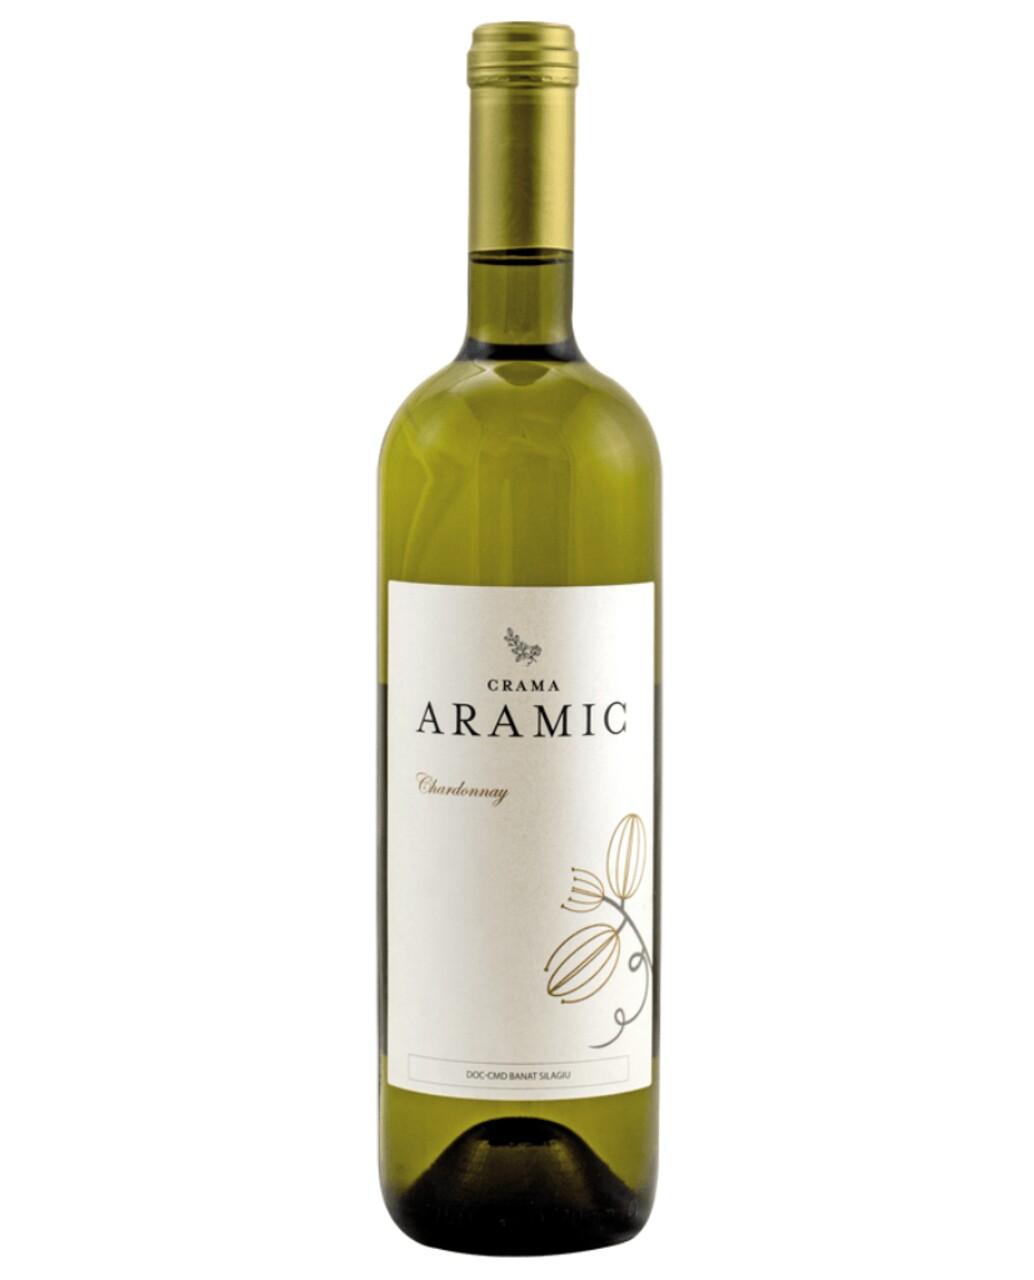 Aramic Chardonnay